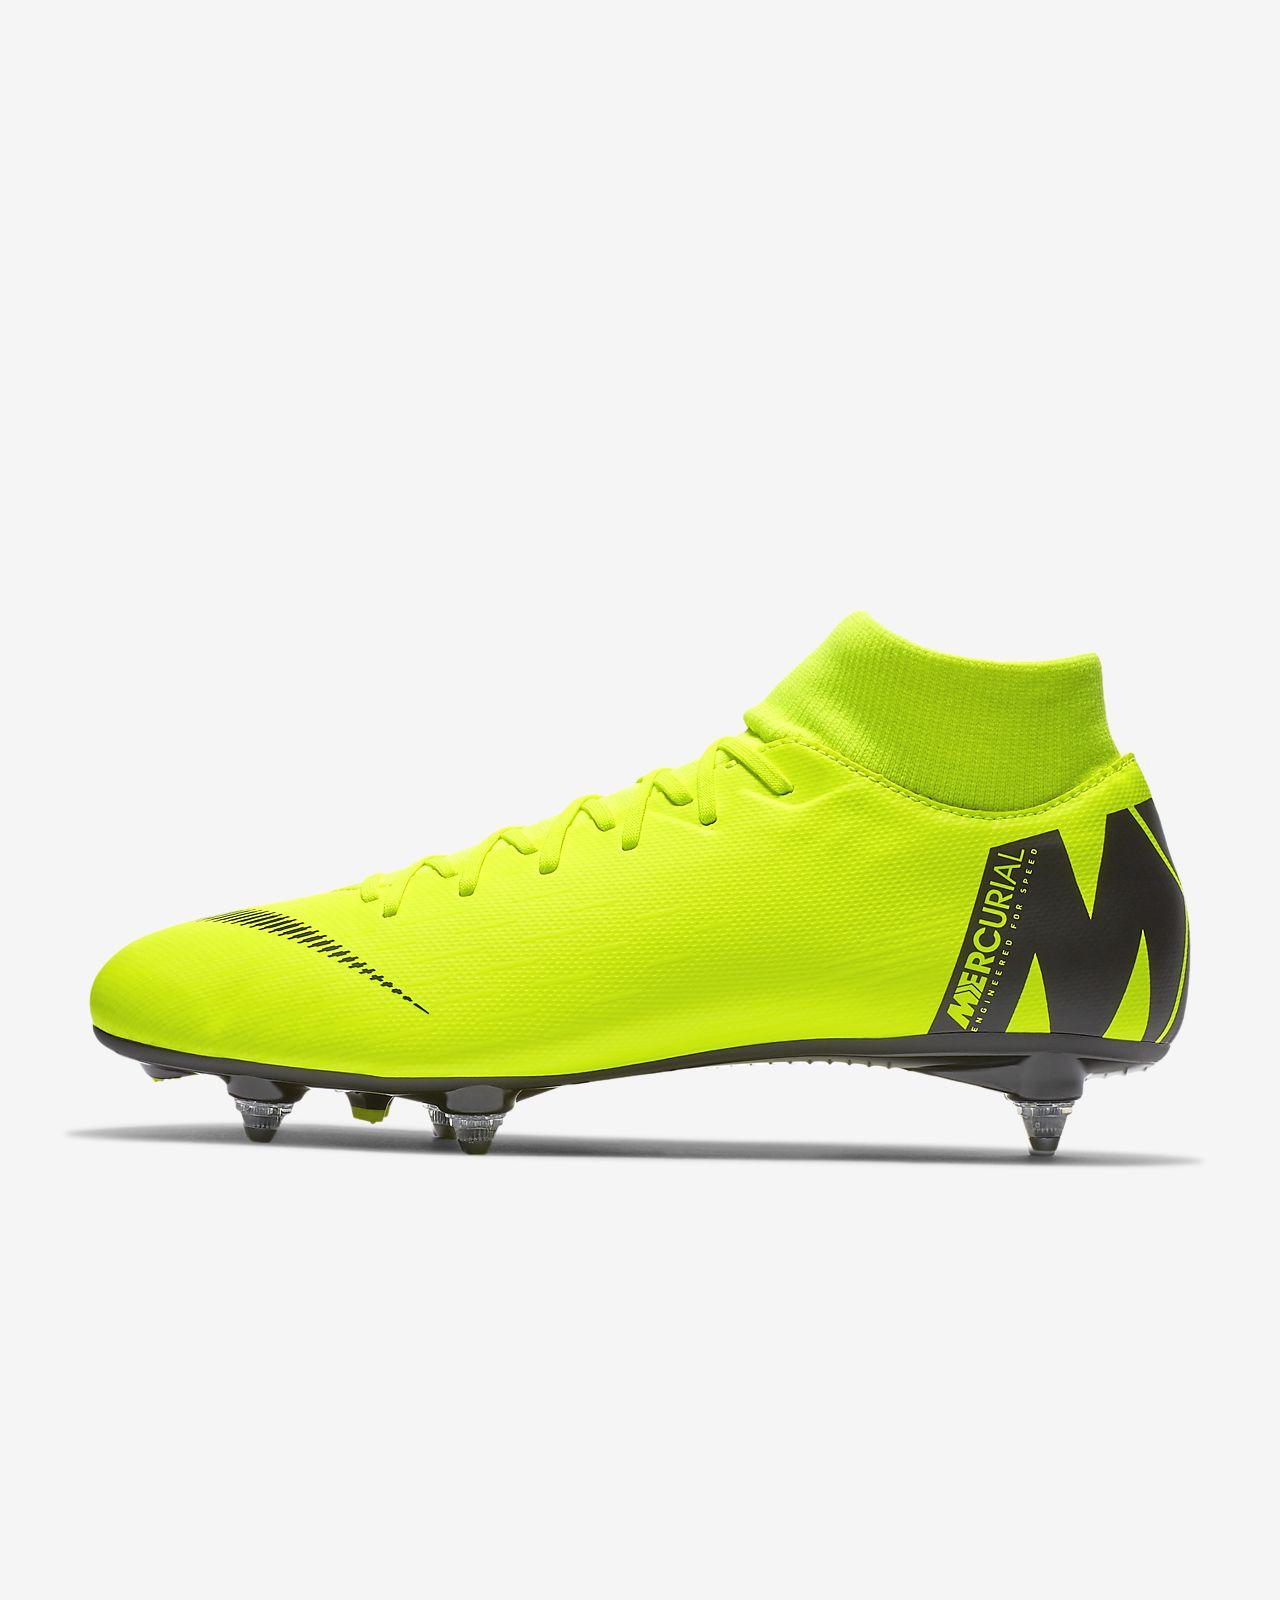 brand new e3bd5 5ba96 ... Chaussure de football à crampons pour terrain gras Nike Mercurial  Superfly VI Academy SG-PRO